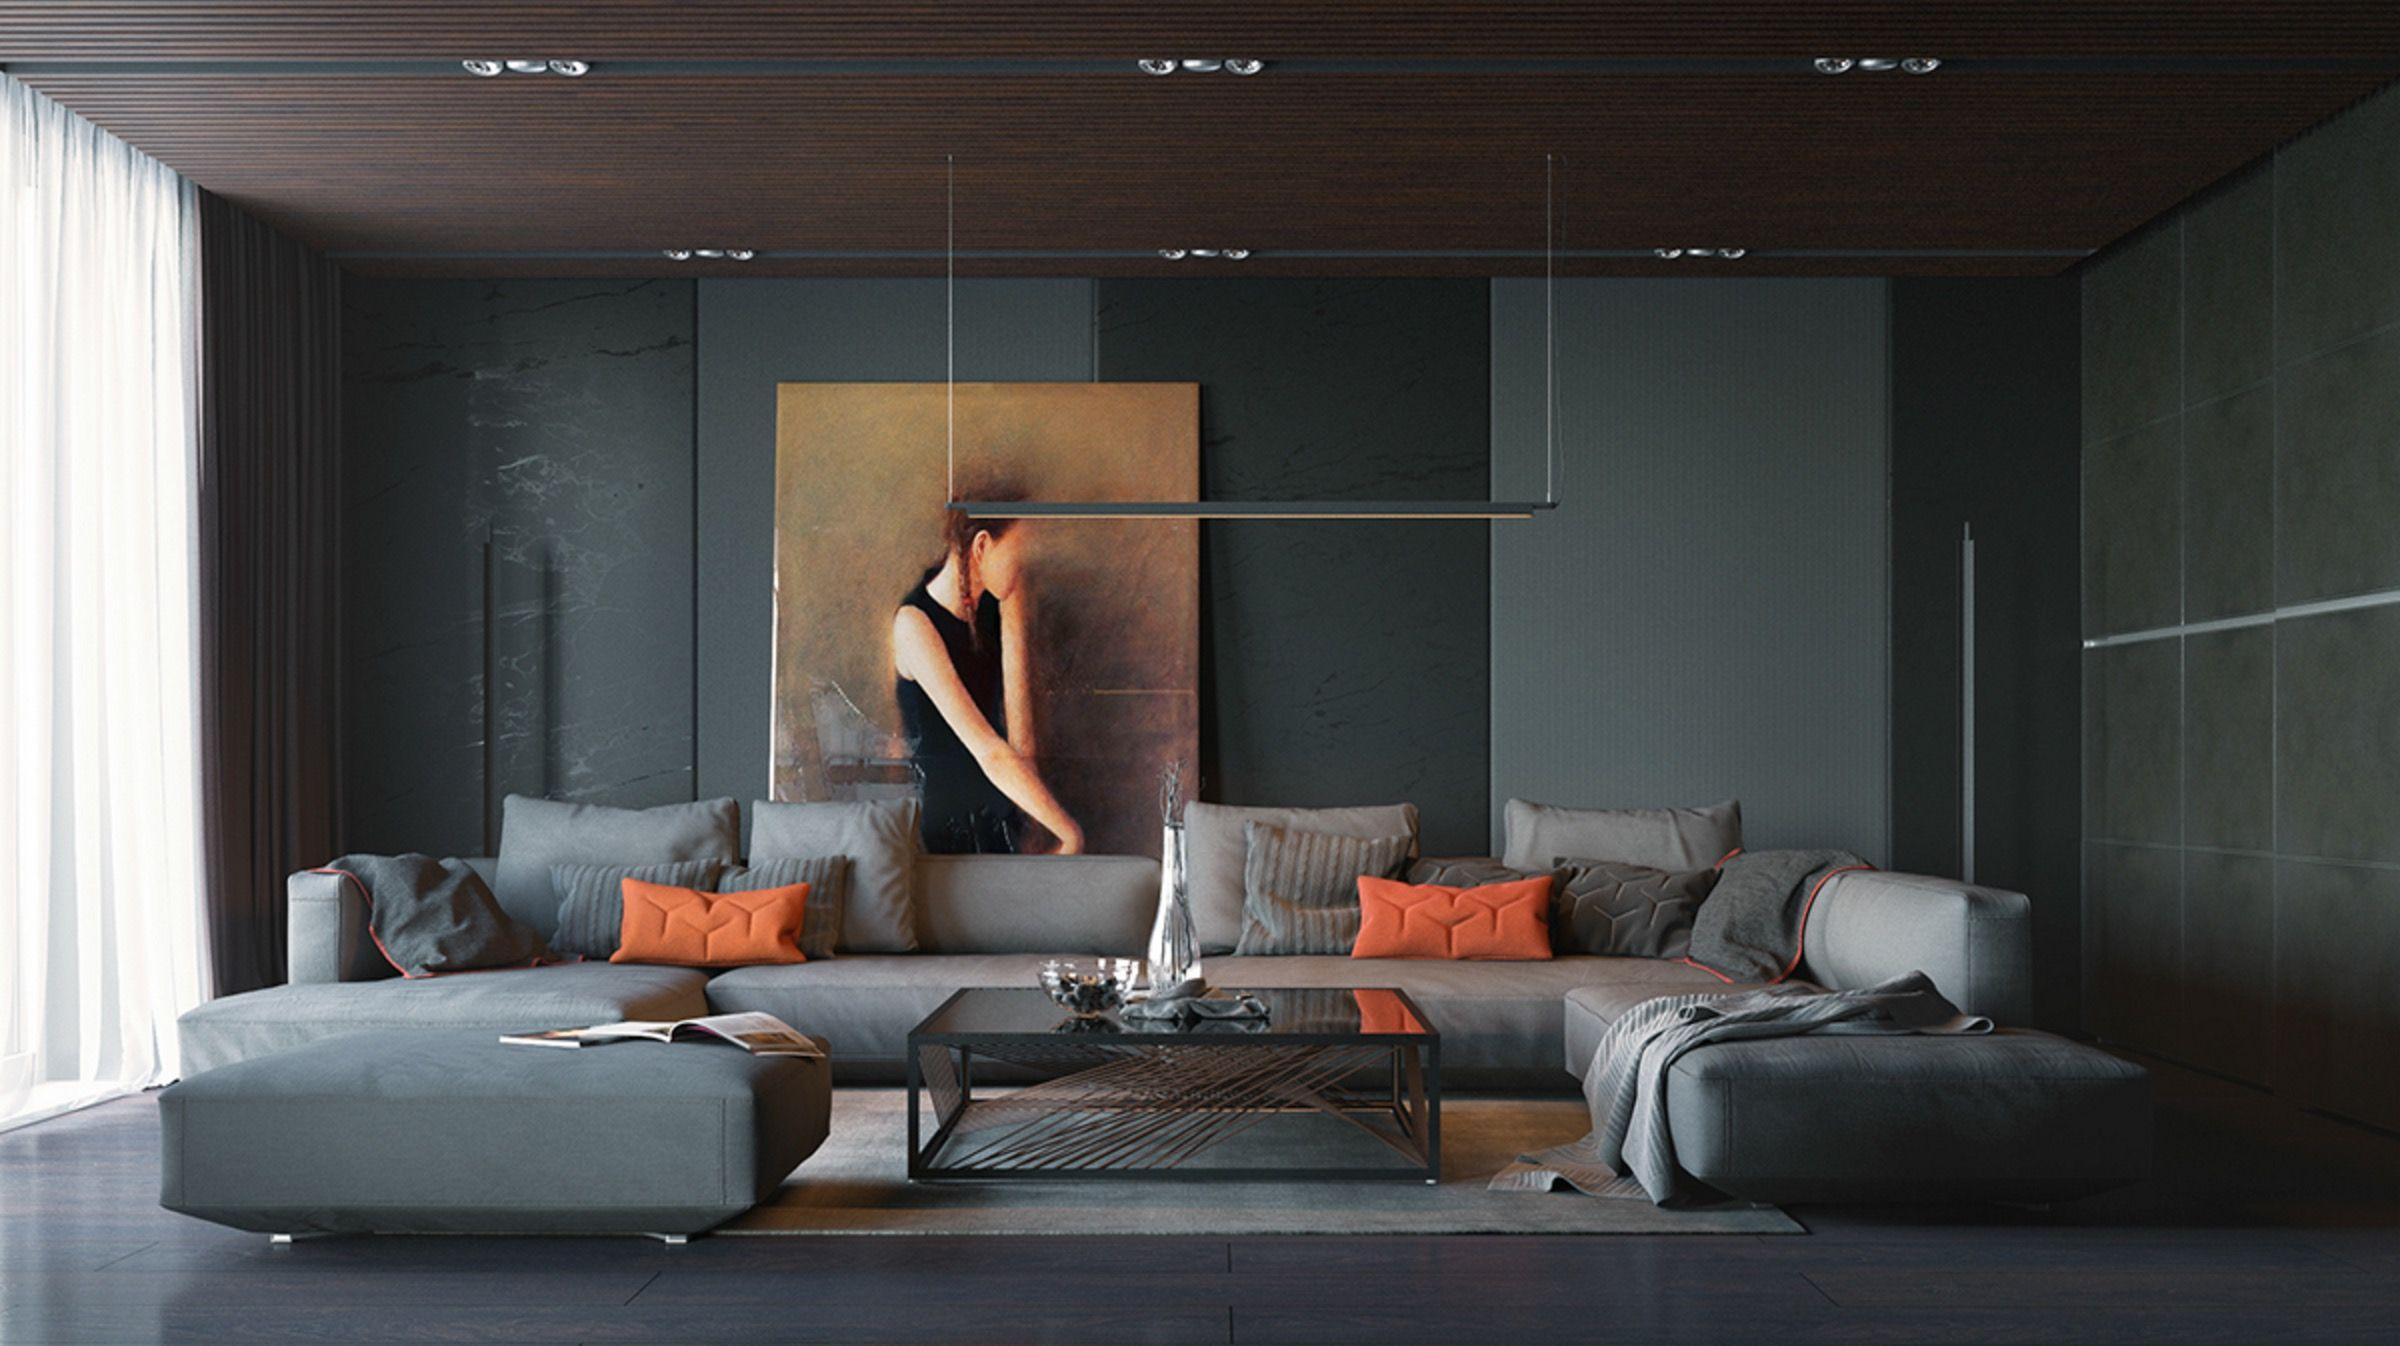 interior design fabrics - 1000+ images about M&M - salas on Pinterest Boconcept, Large ...